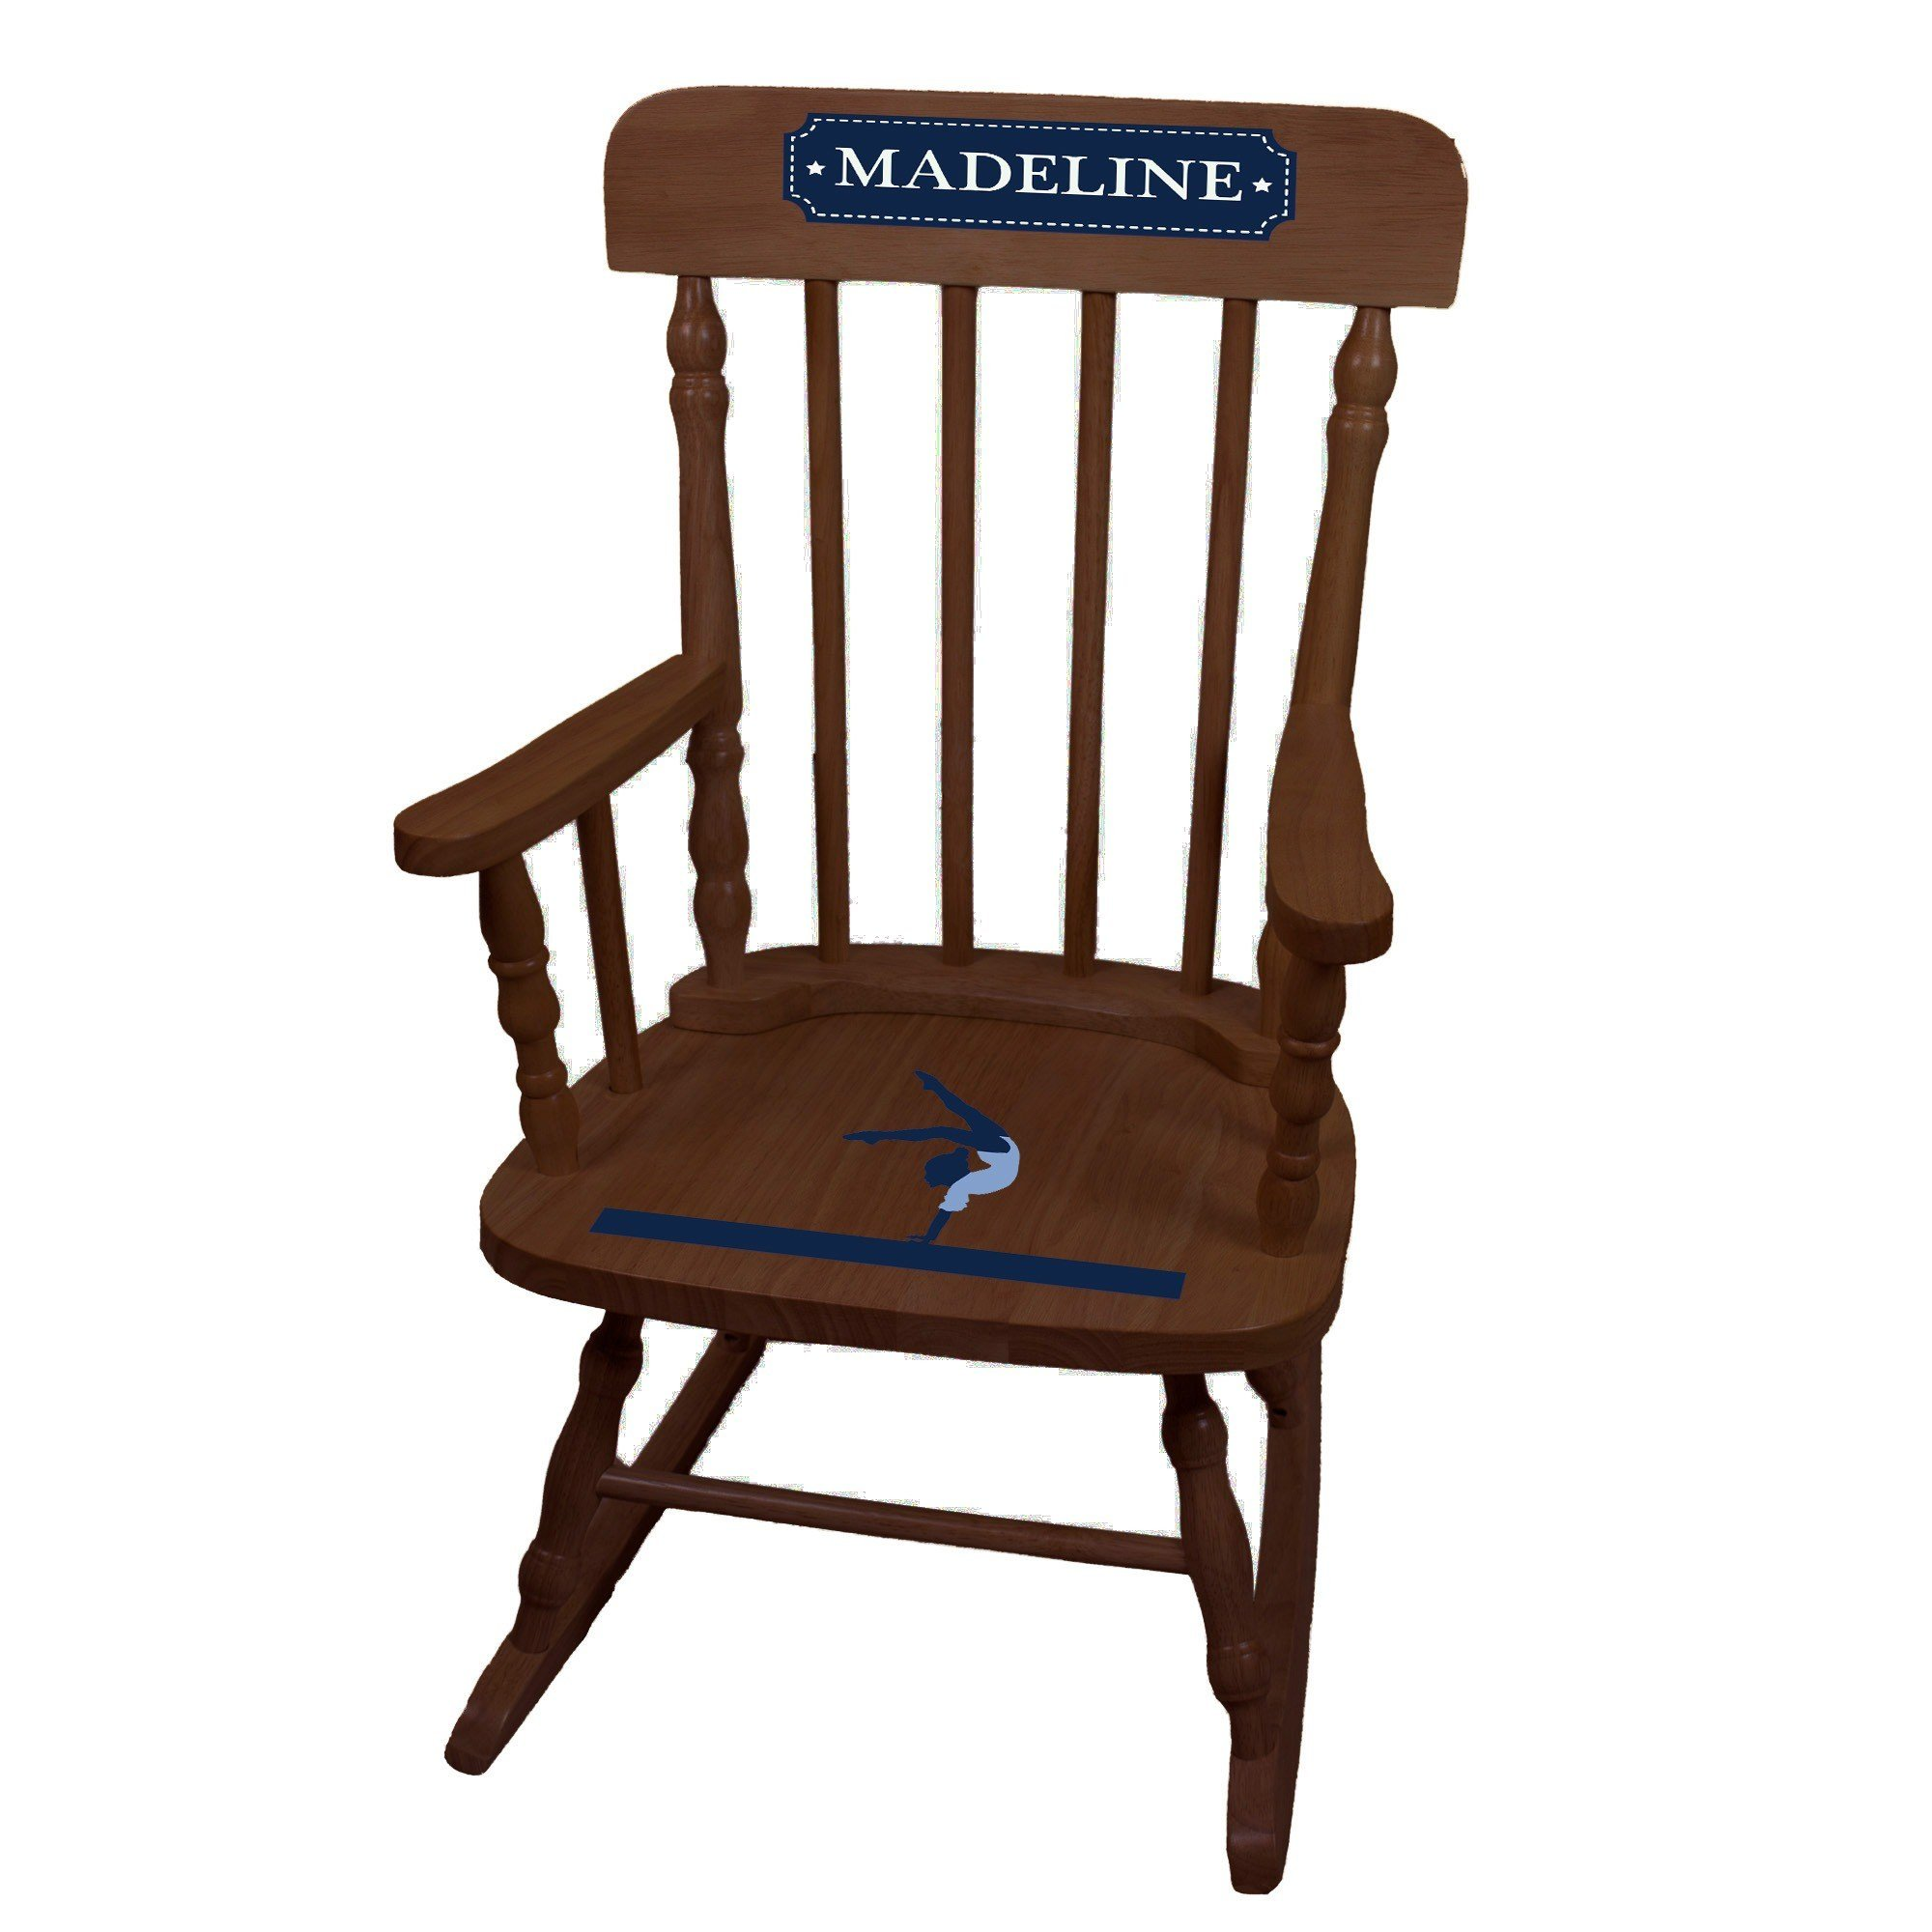 MyBambino Personalized Gymnastics Espresso Childrens Rocking Chair